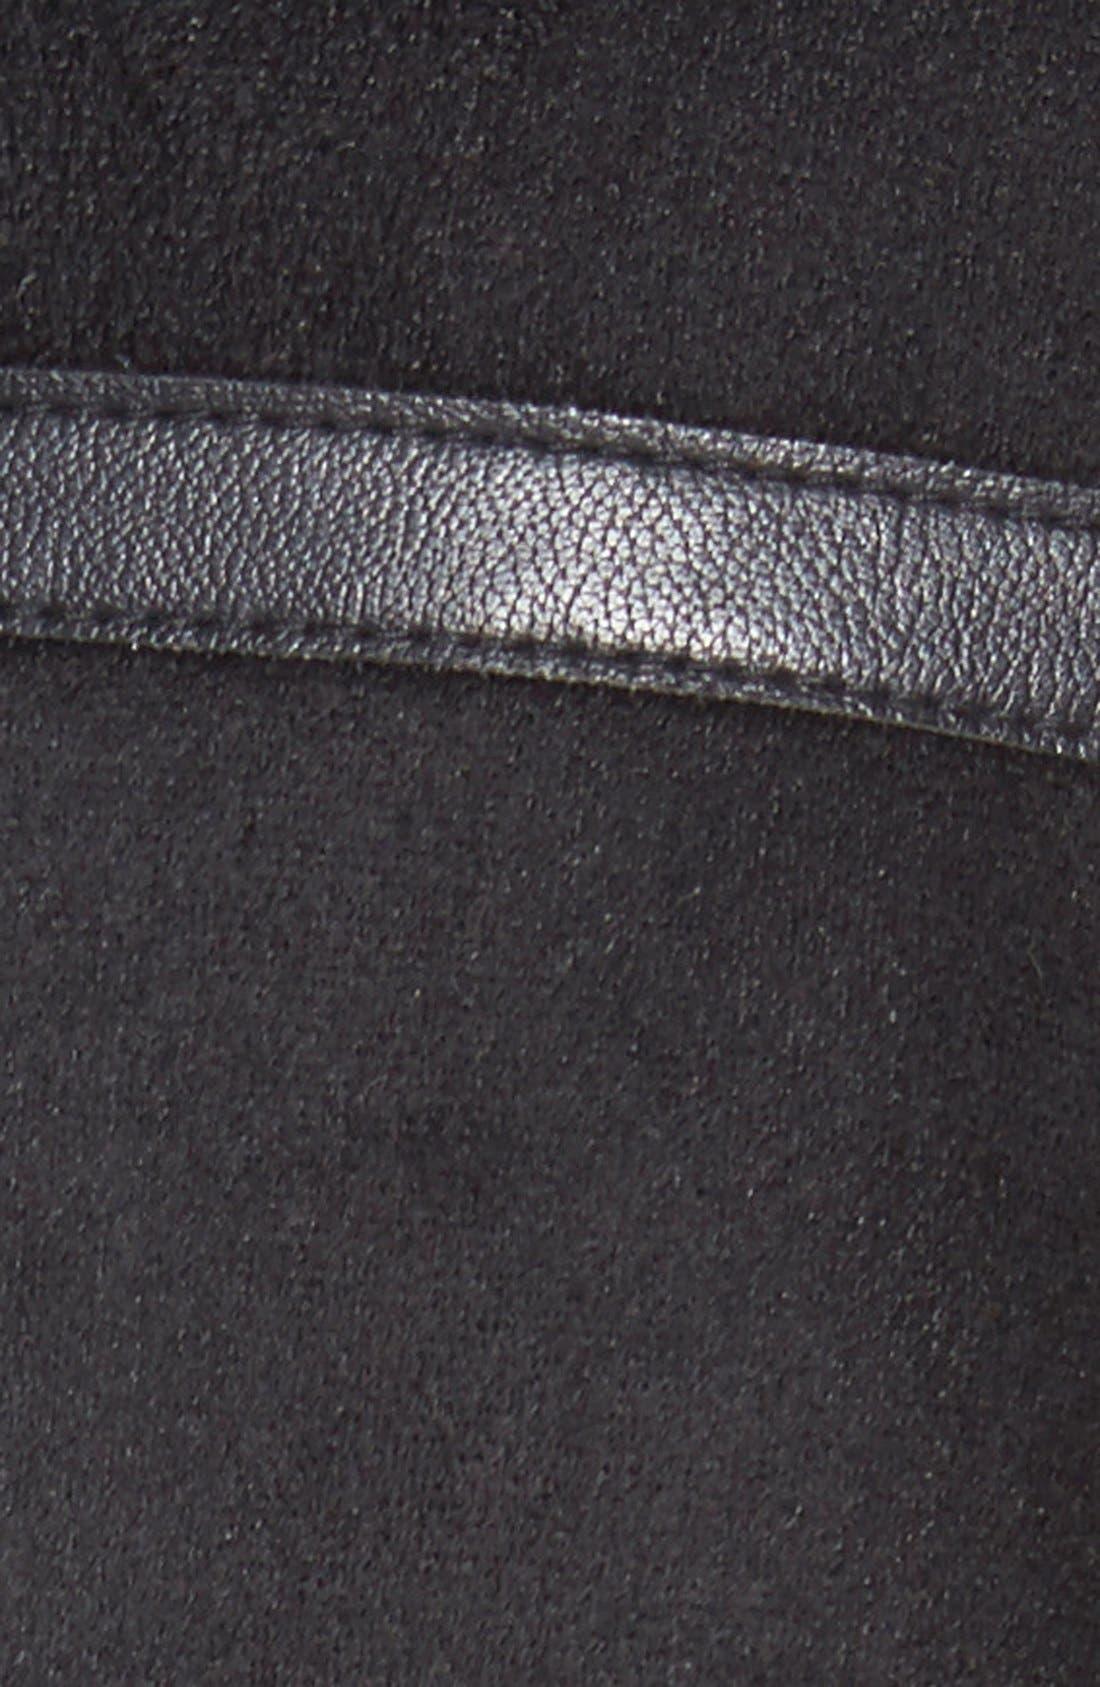 LAUNDRY BY SHELLI SEGAL,                             Laundry by ShelliSegalFauxShearling Moto Jacket,                             Alternate thumbnail 4, color,                             001